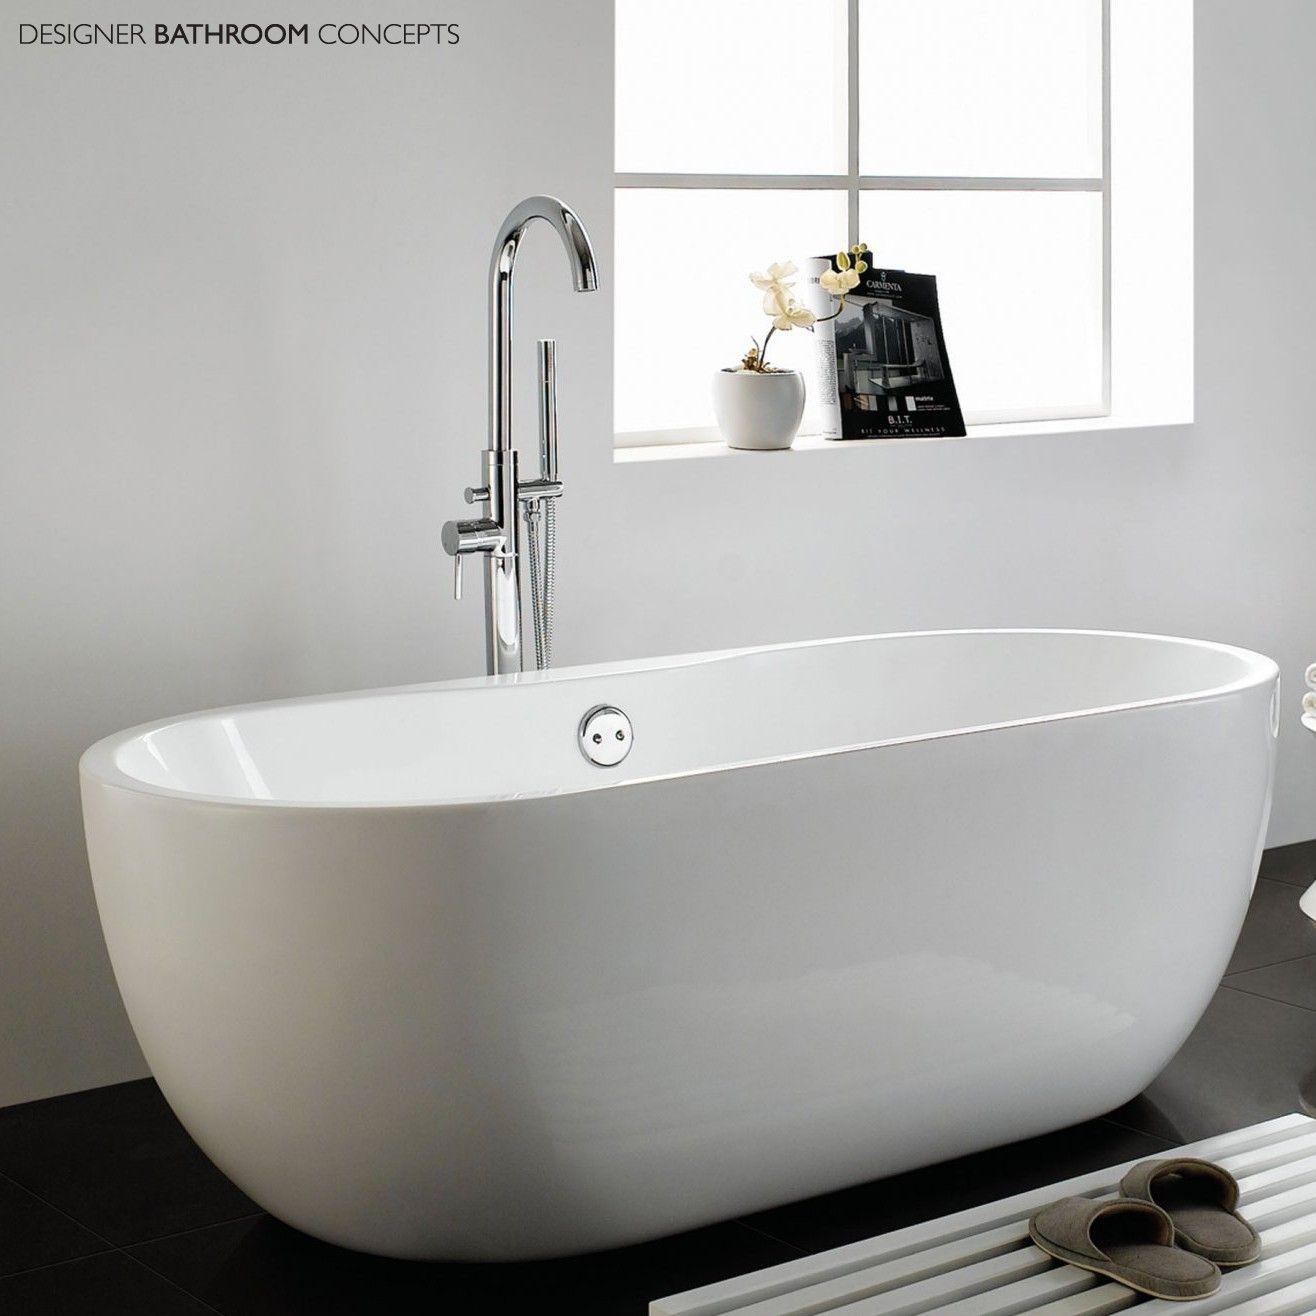 Venice Designer Freestanding Baths   Freestanding bath, Bath and ...